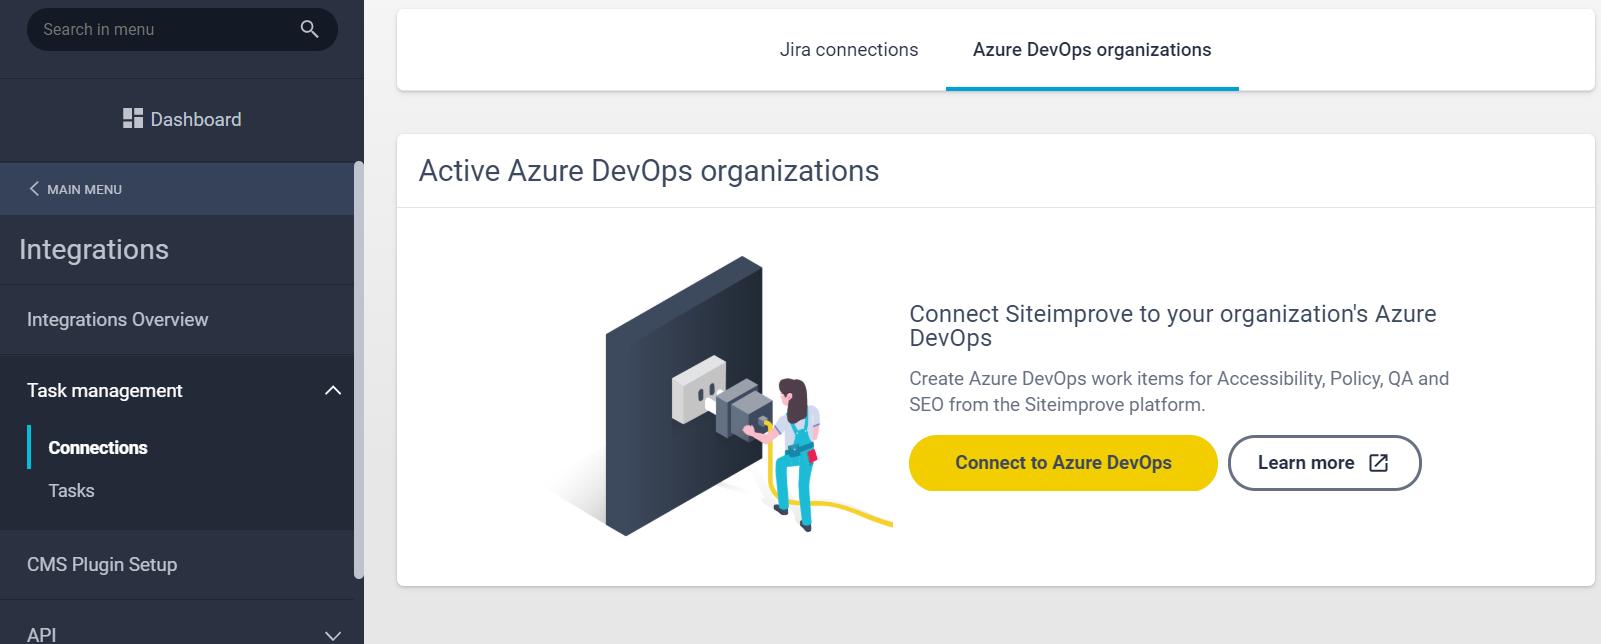 Azure_DevOps_connect_page_under_integrations